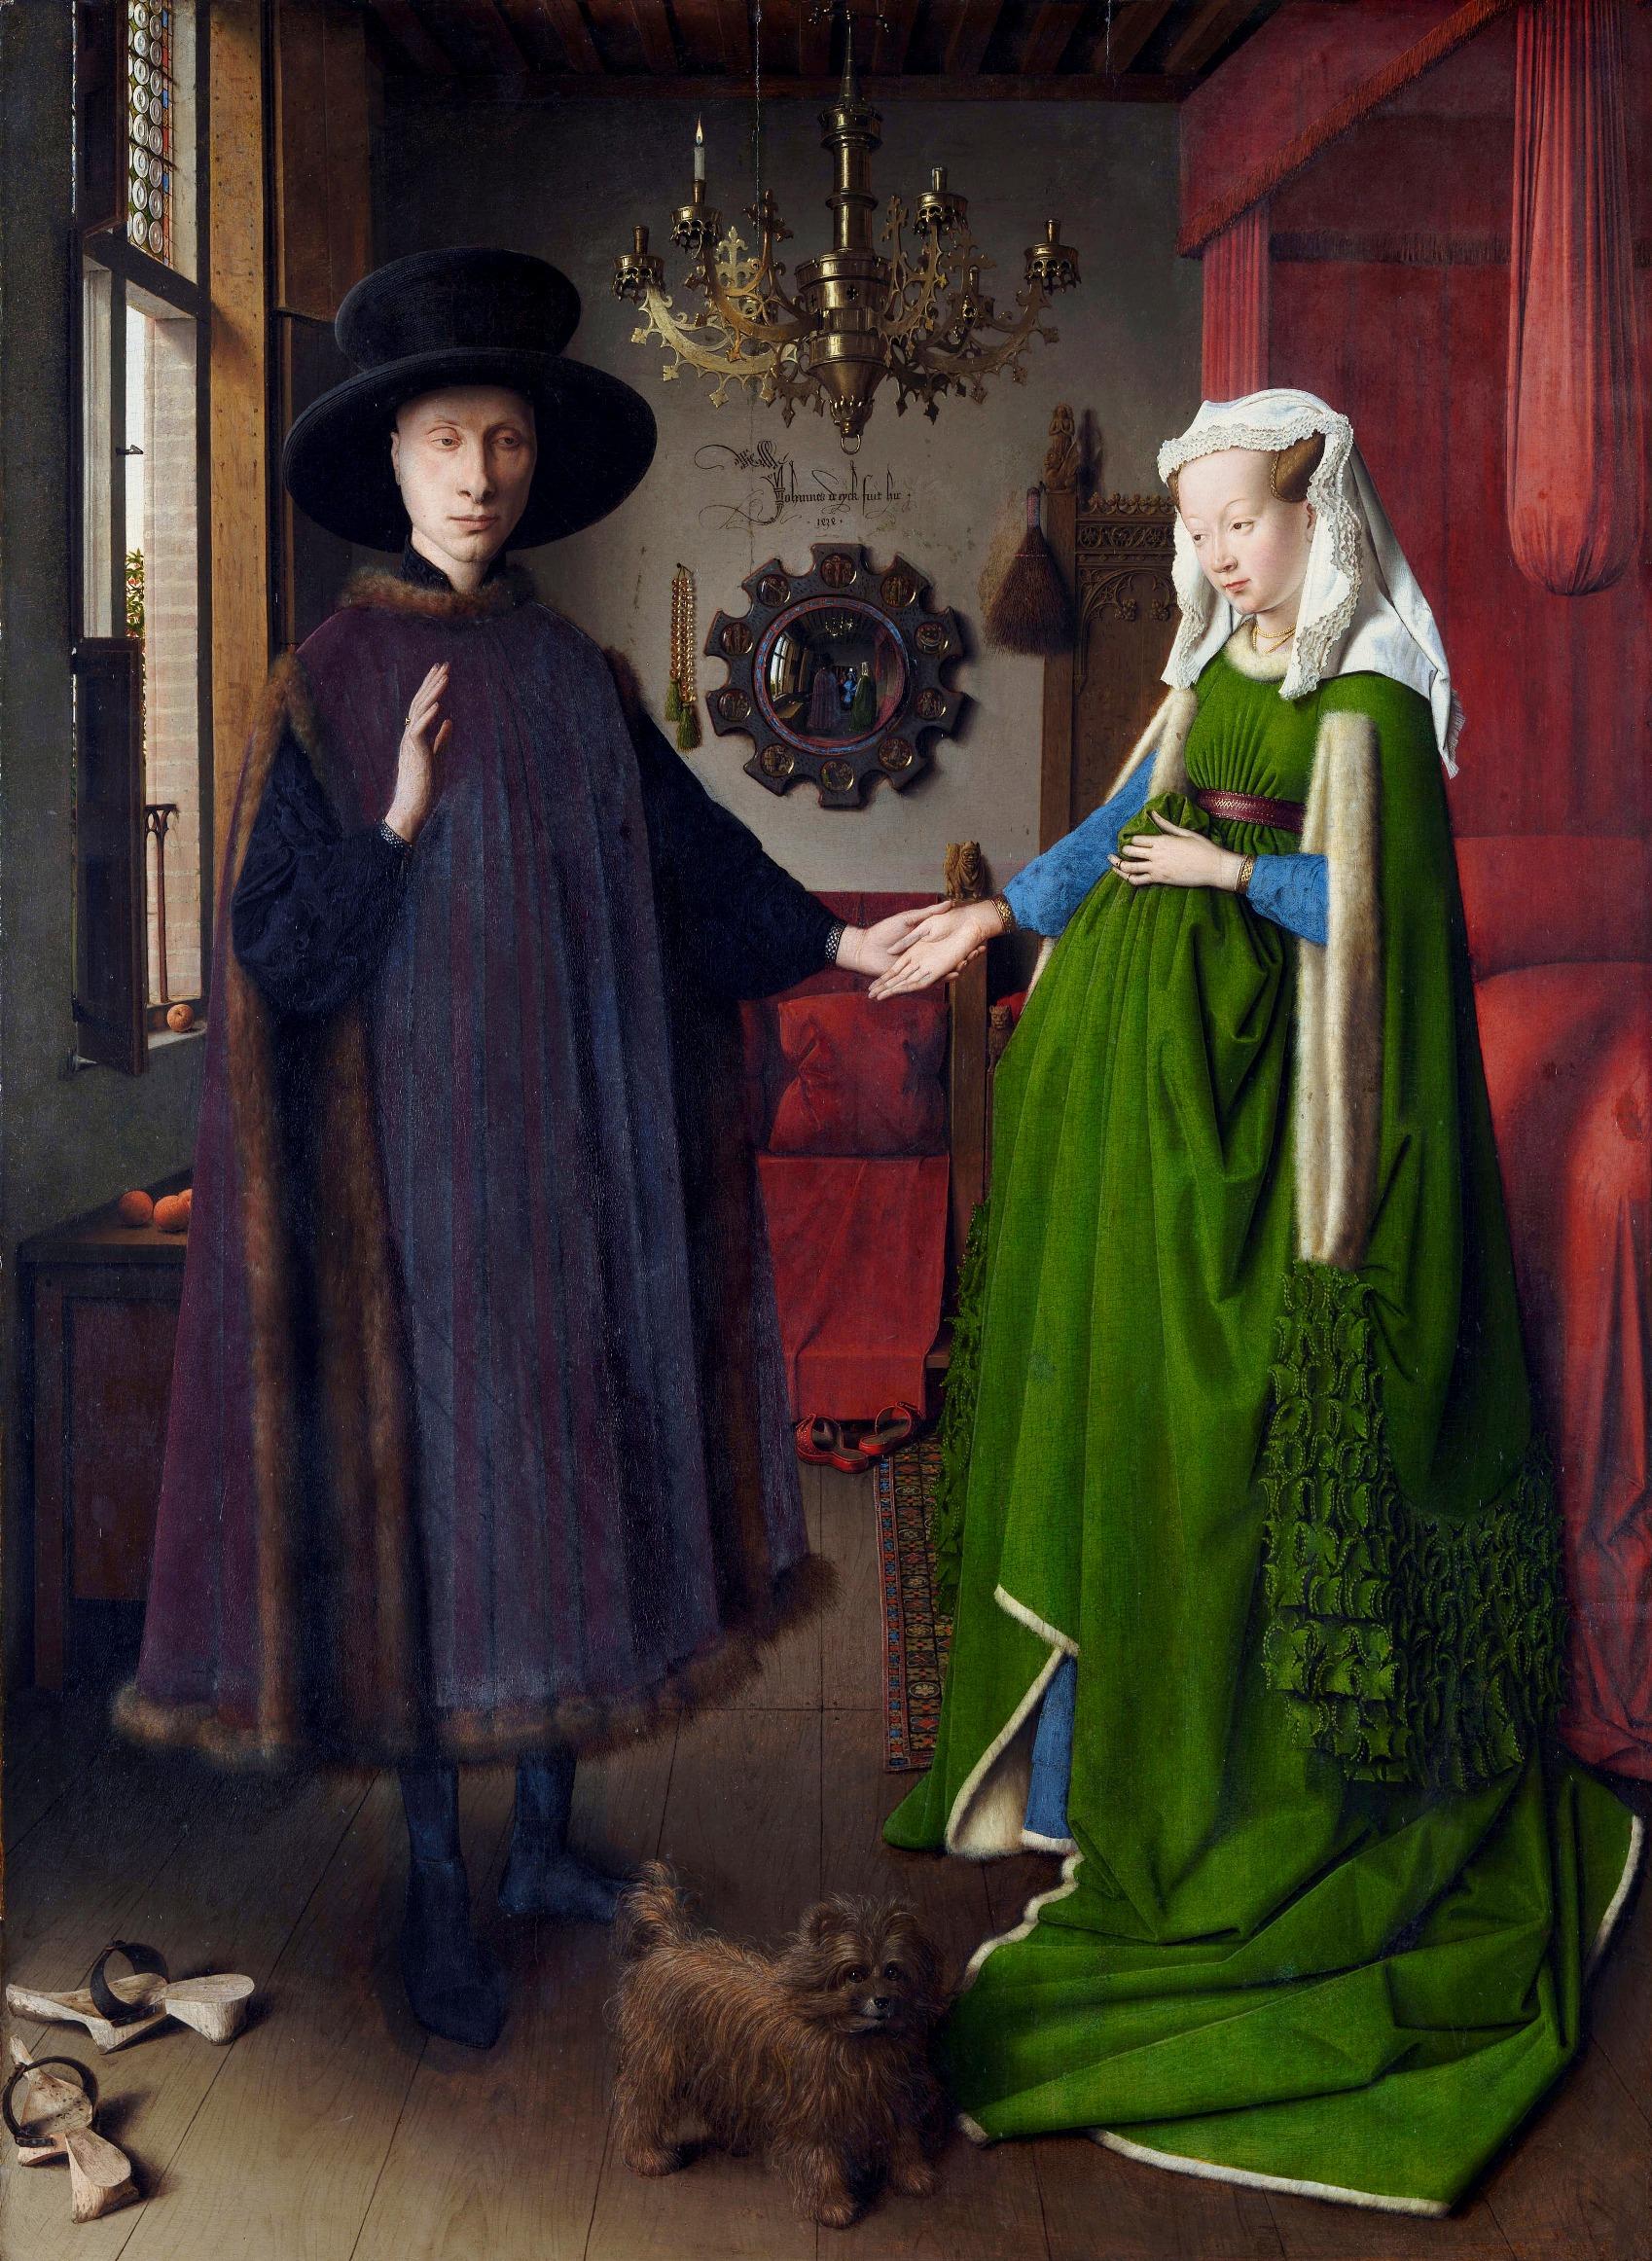 乔凡尼画像(?)阿尔诺菲尼和他的妻子_Portrait of Giovanni (?) Arnolfini and his Wife-扬·凡·艾克